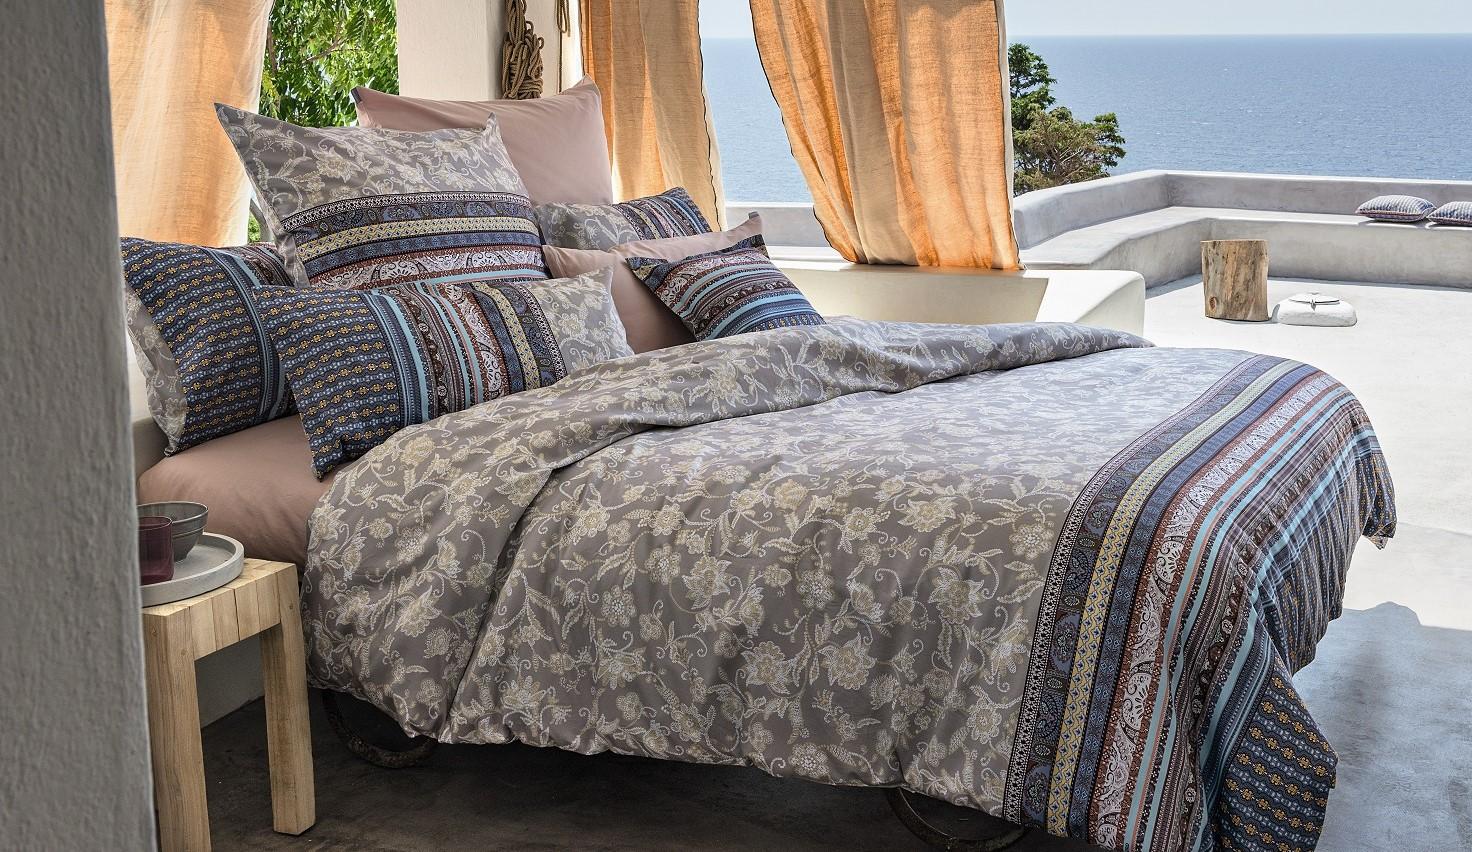 italienische bettw sche in zarten farben dorma vita. Black Bedroom Furniture Sets. Home Design Ideas